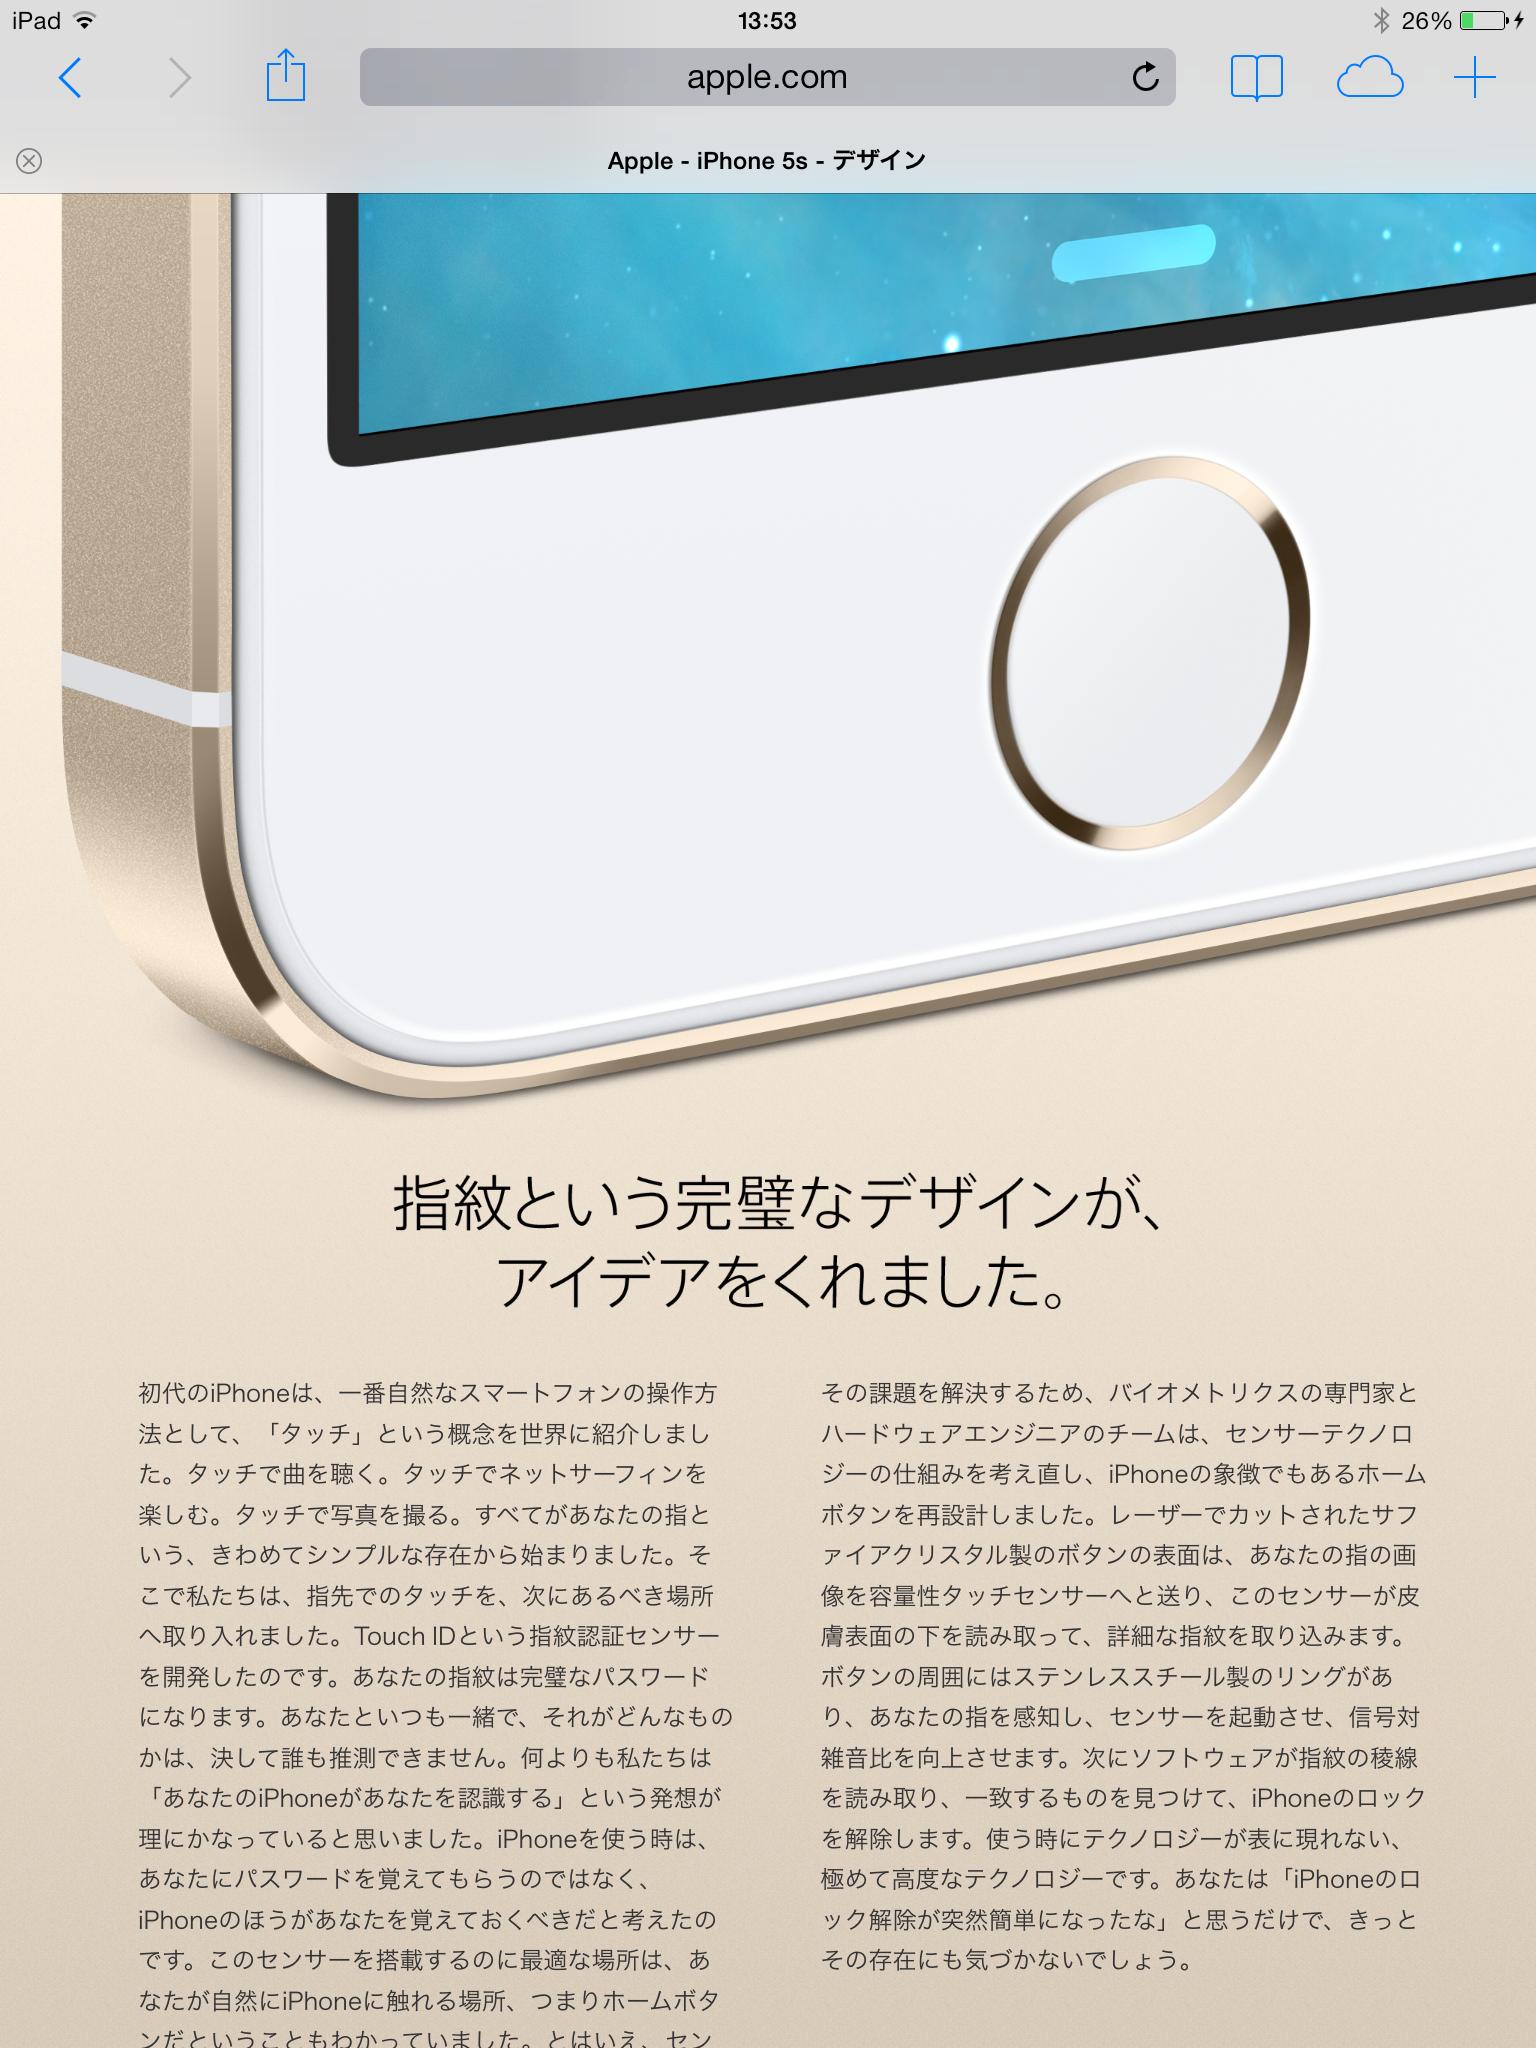 iPad の Safari におけるタイトル (ページタブ) 表示